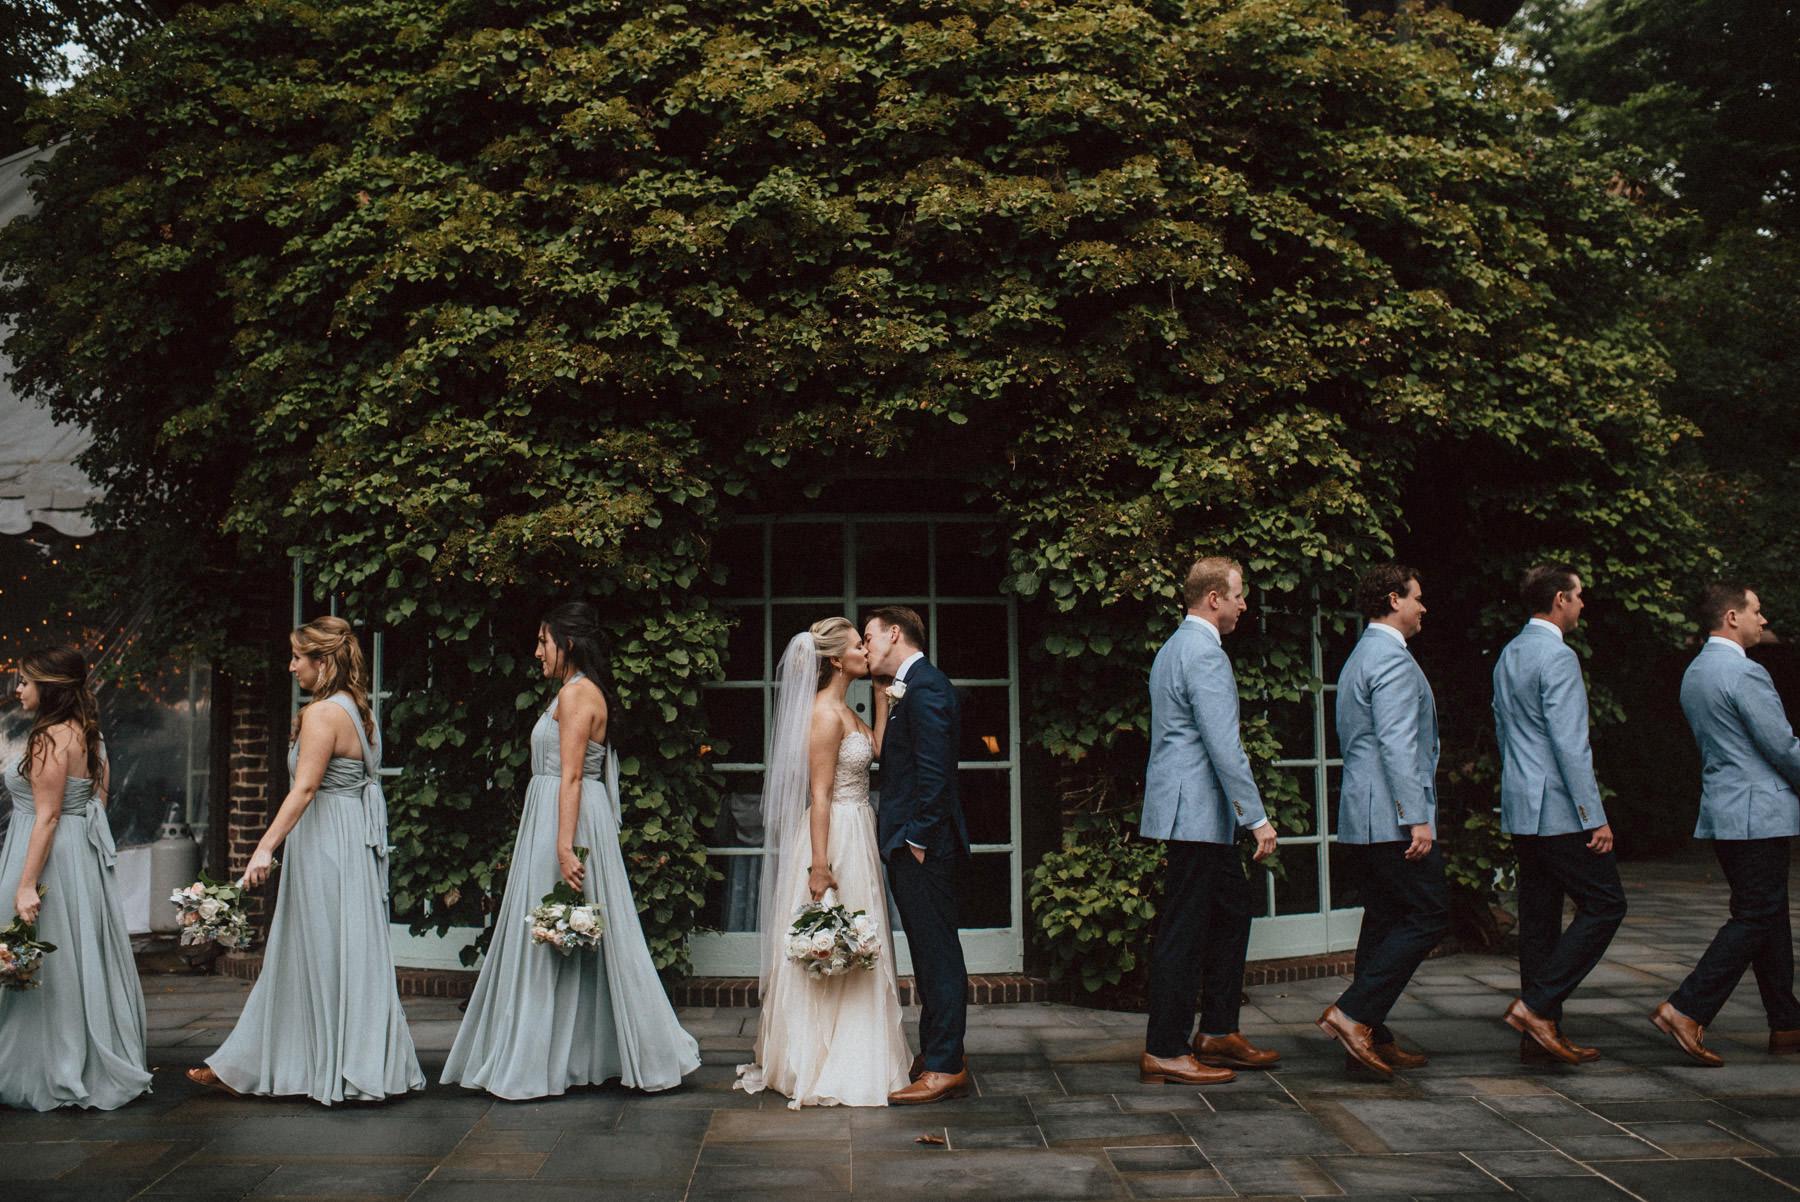 253-greenville-country-club-wedding-18.jpg